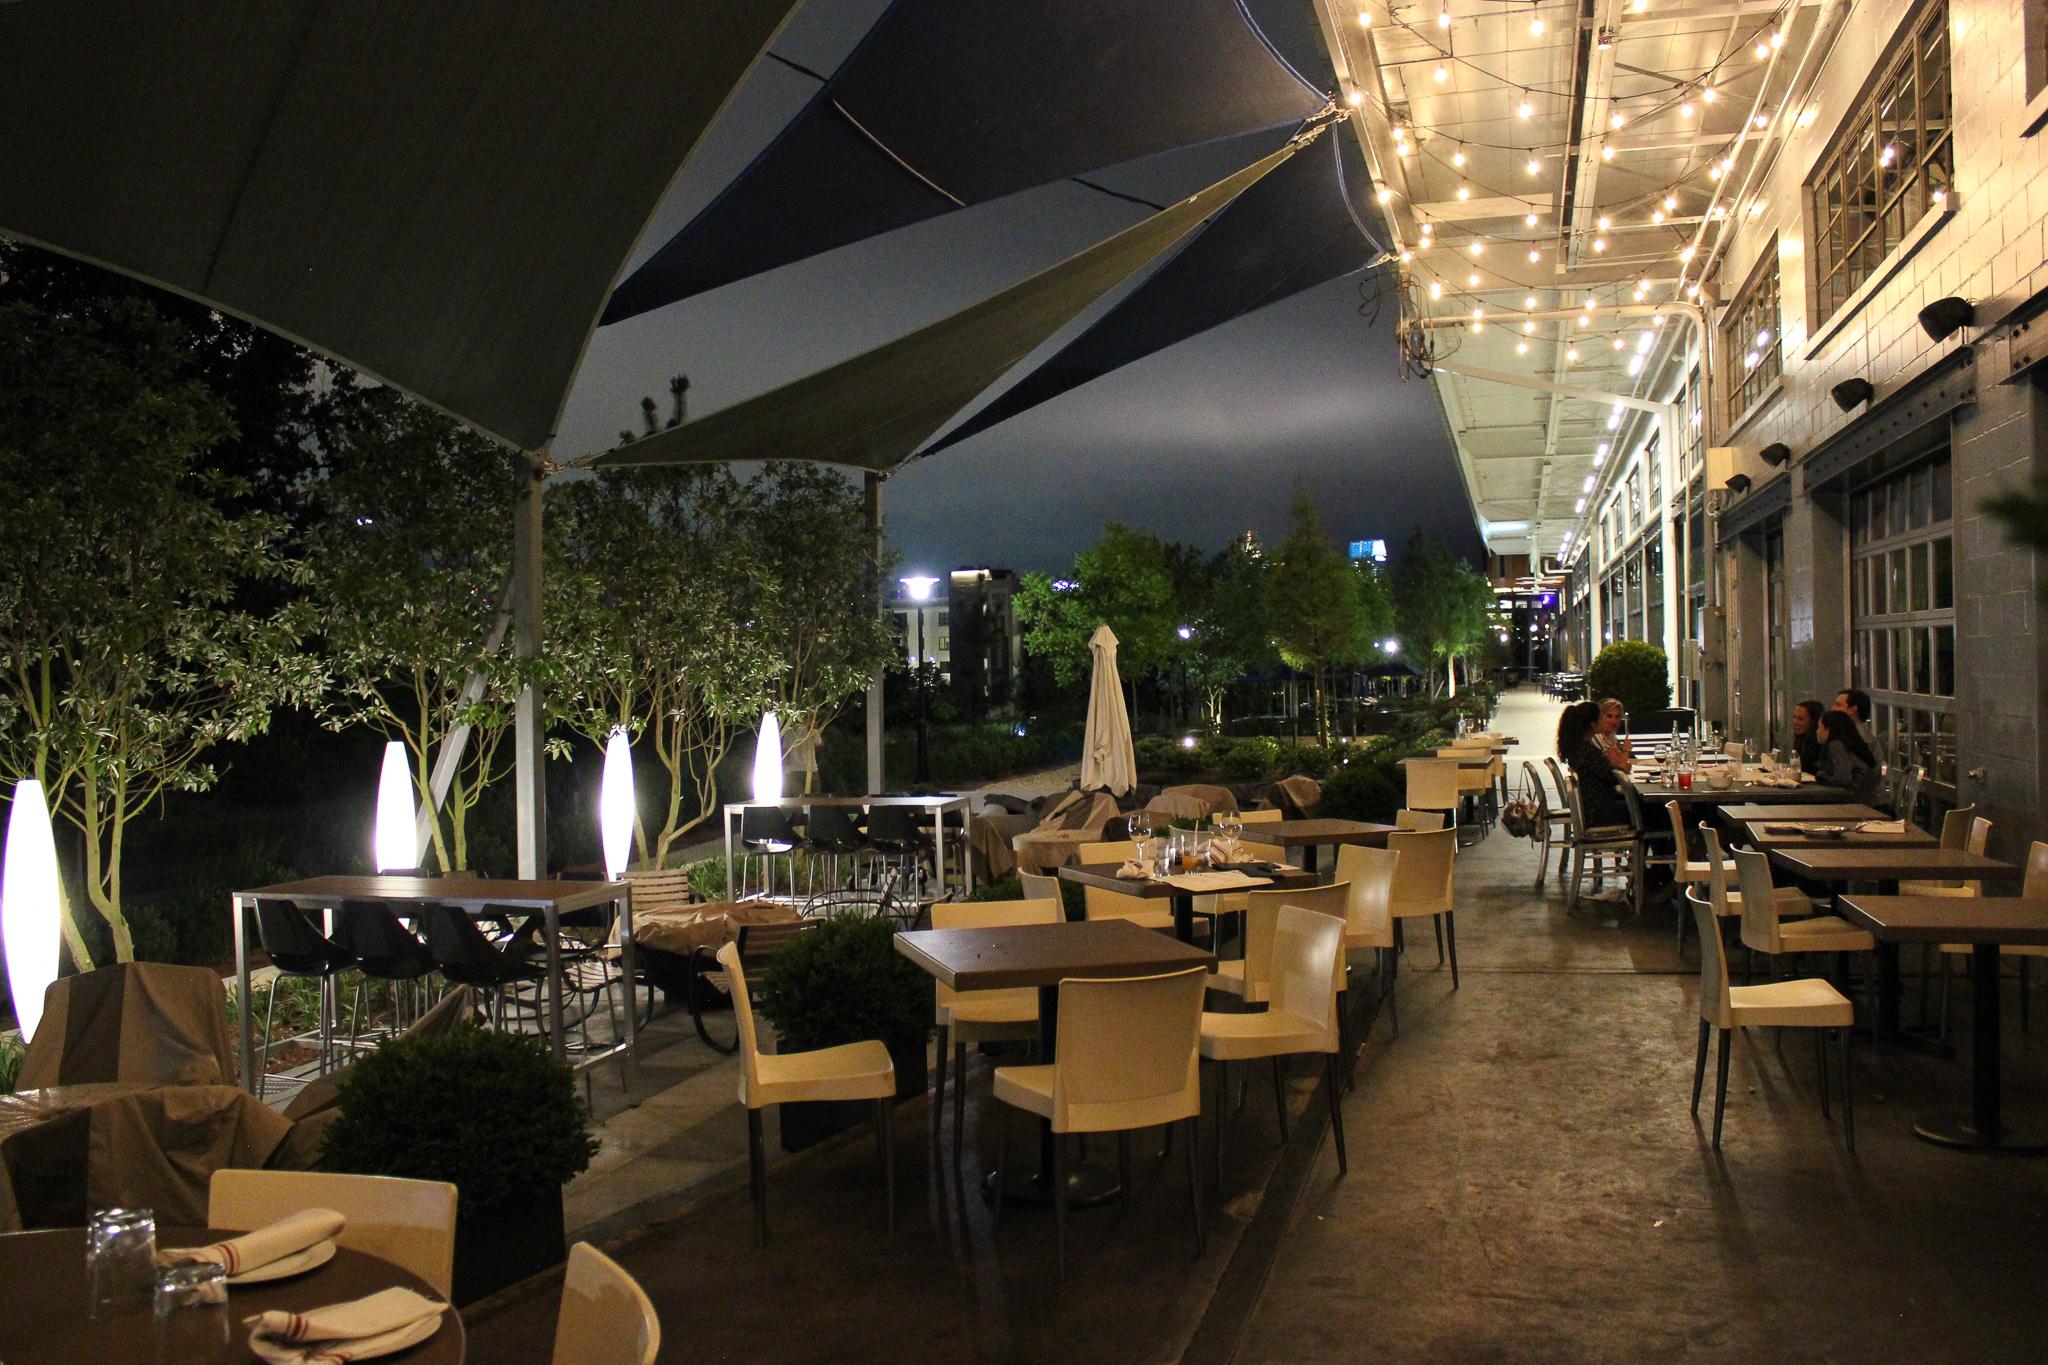 The outdoor patio at Two Urban Licks, overlooking the Atlanta Beltline (c) Anna Lanfreschi